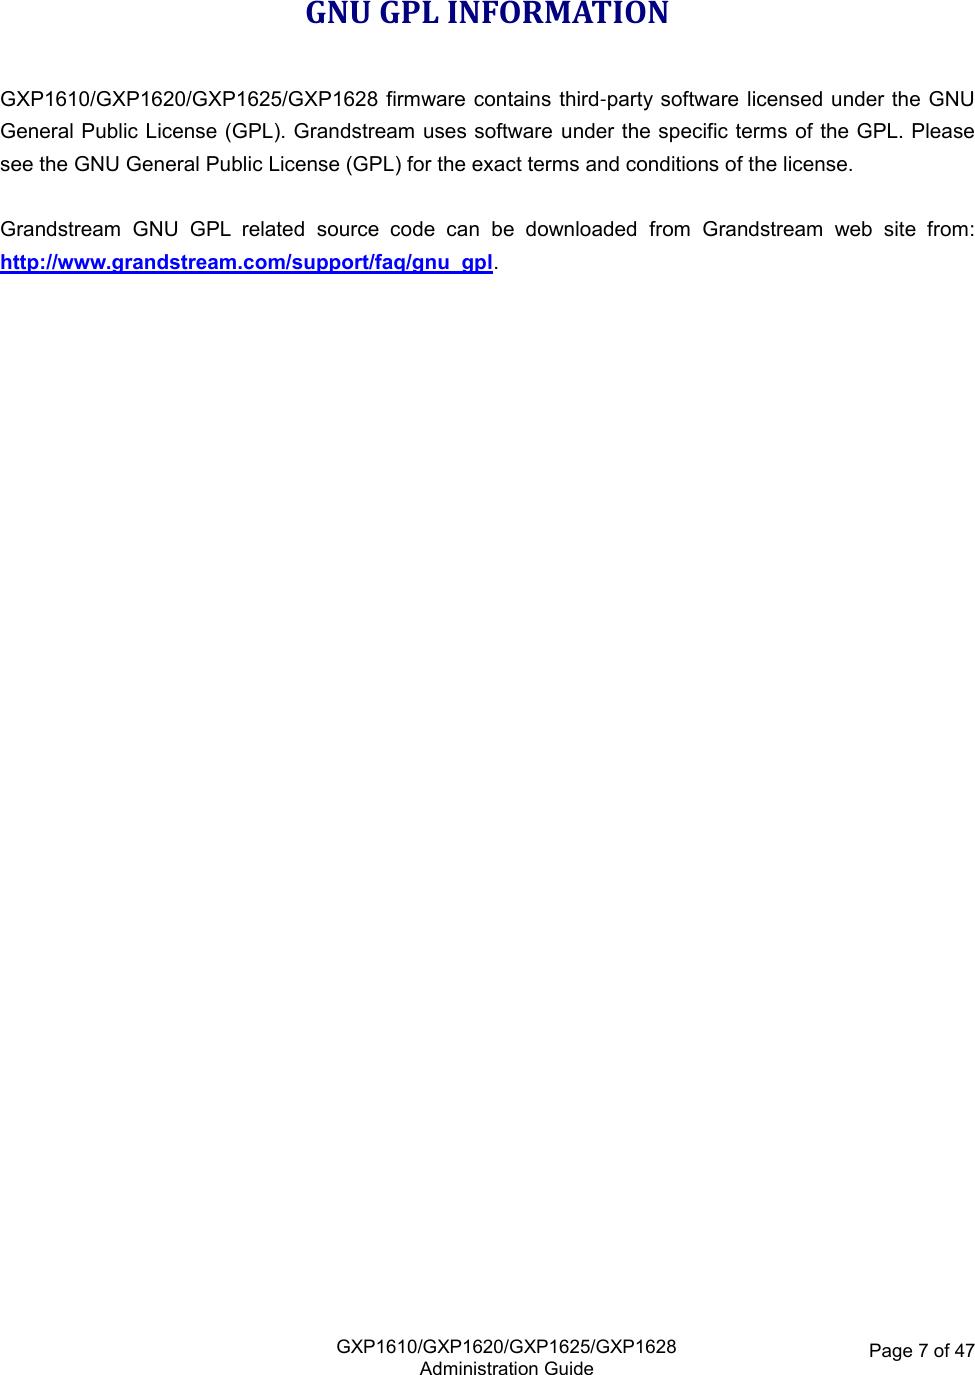 gxp1628 user manual